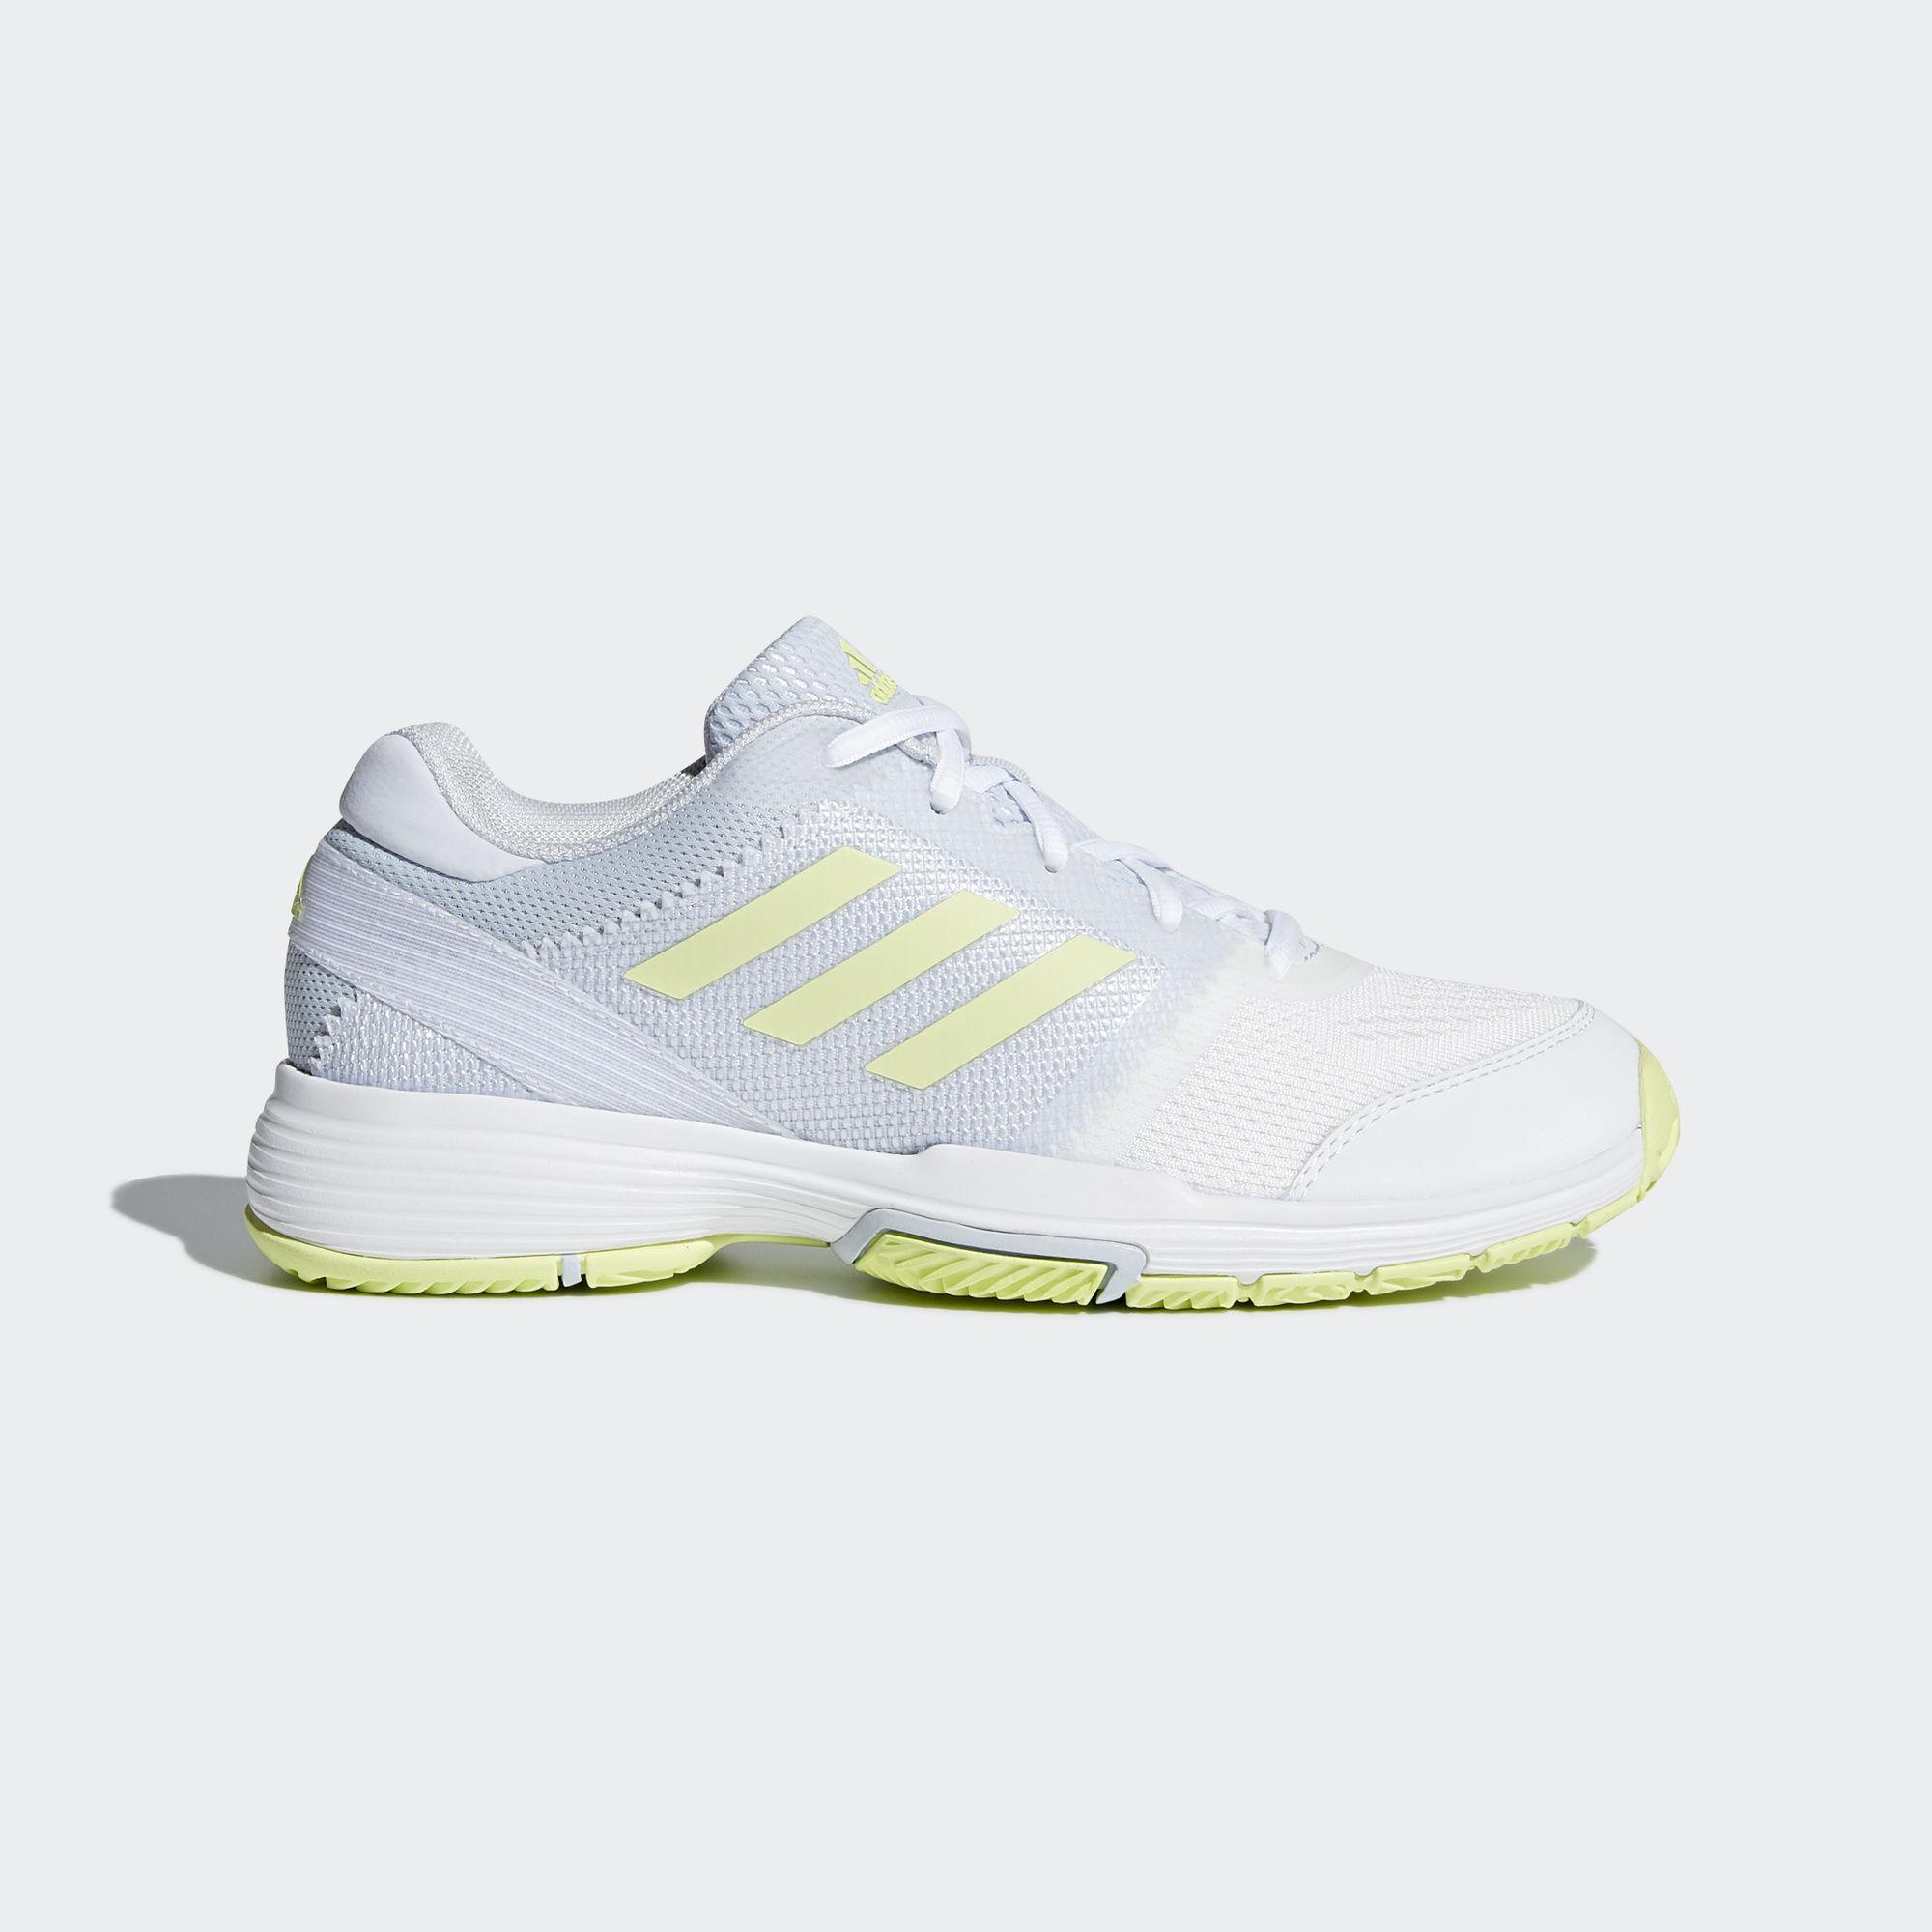 Adidas Womens Barricade Club Tennis Shoes - White/Blue/Yellow